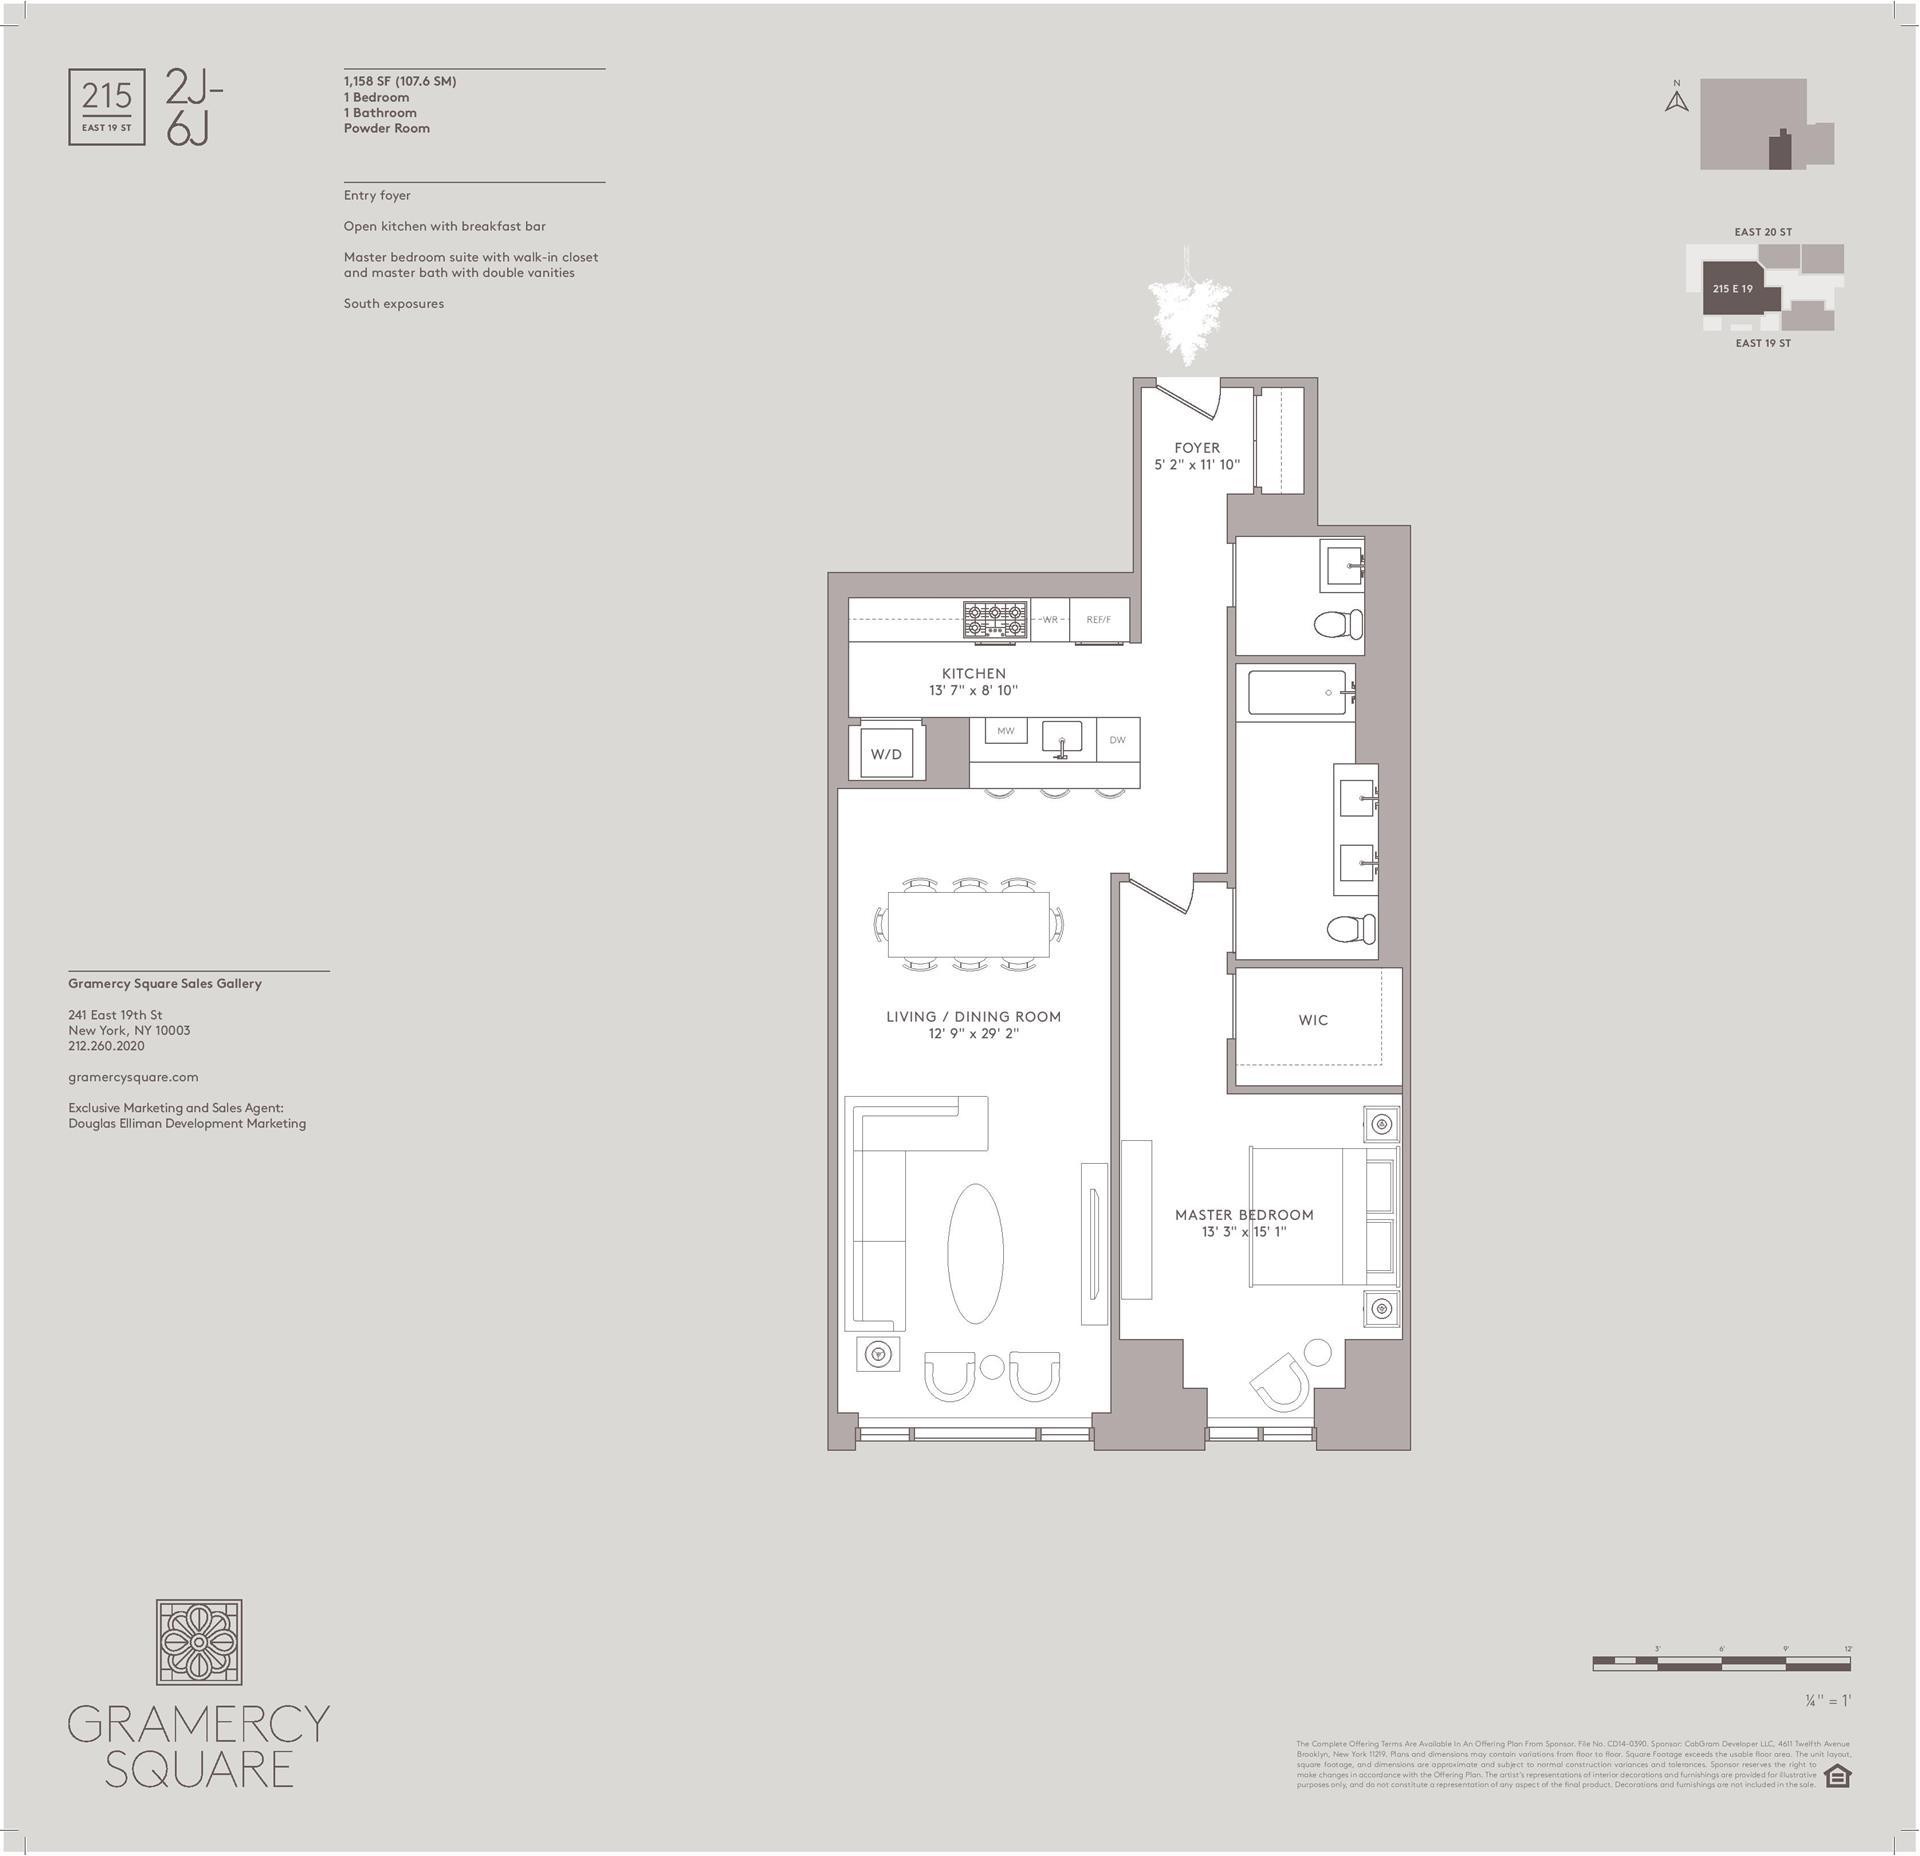 Floor plan of Gramercy Square, 215 East 19th St, 6J - Gramercy - Union Square, New York